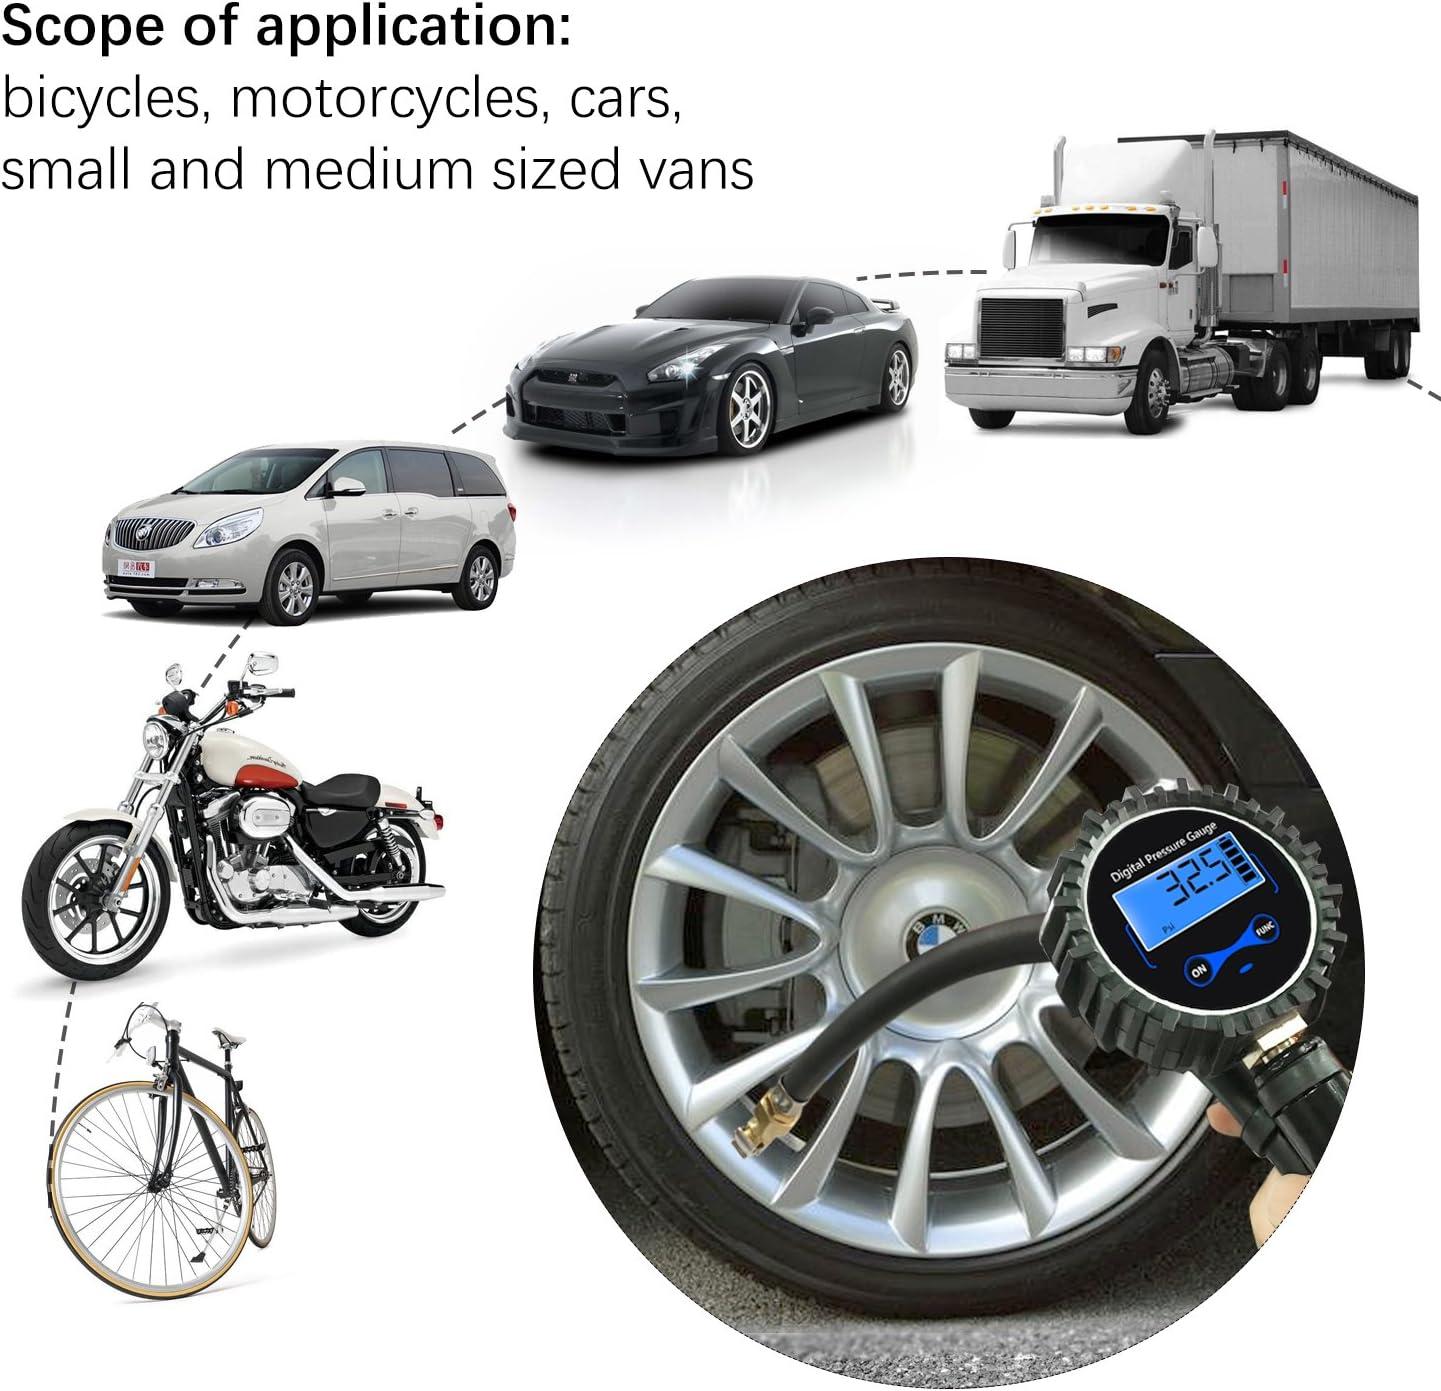 Longruner 250 PSI Man/ómetro Digital Medidor de Presi/ón de Neum/áticos con Manguera y Acoplador para Motocicleta Bcicleta y Coche Pantalla LCD LV12